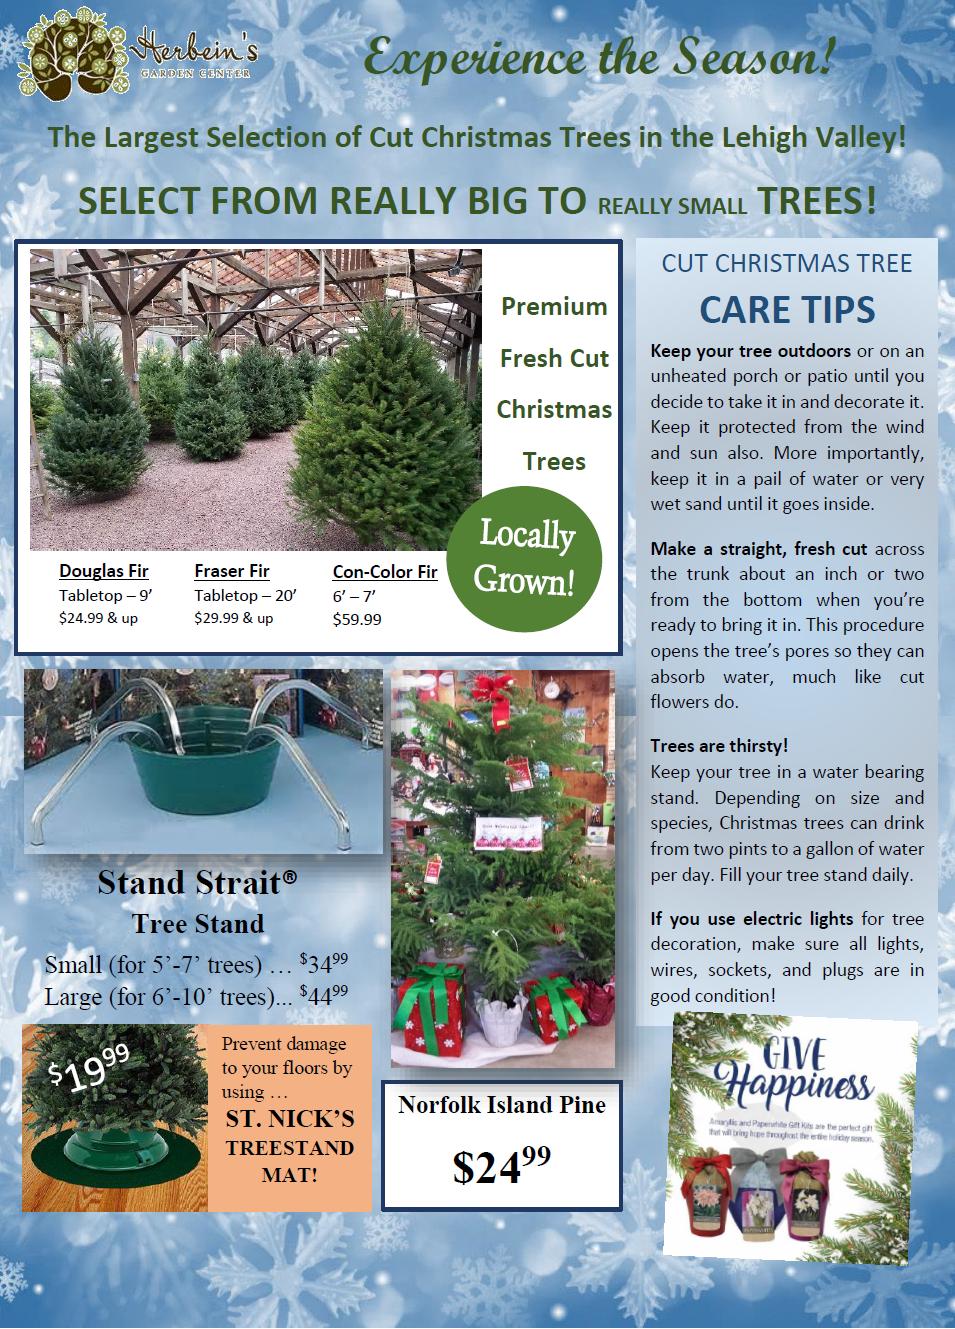 Herbeins Garden Center Holiday Guide 2018 pg.2